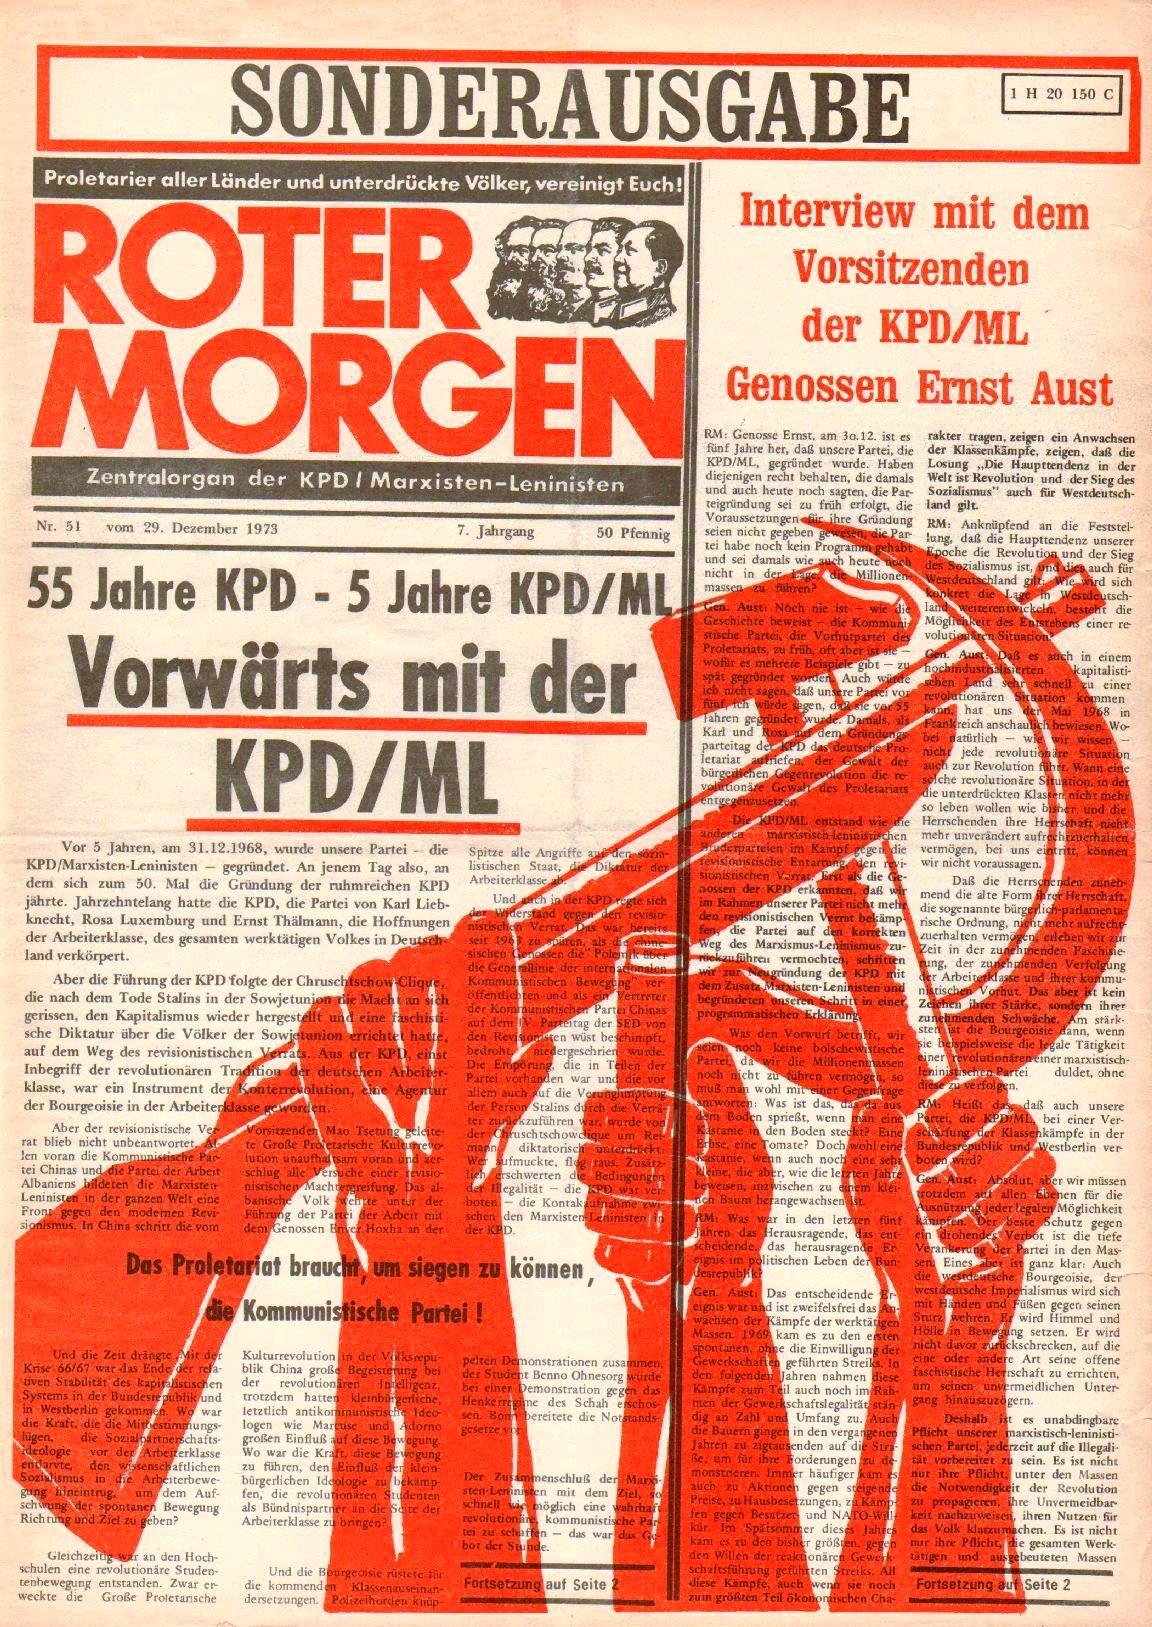 Roter Morgen, 7. Jg., 29. Dezember 1973, Nr. 51, Seite 1